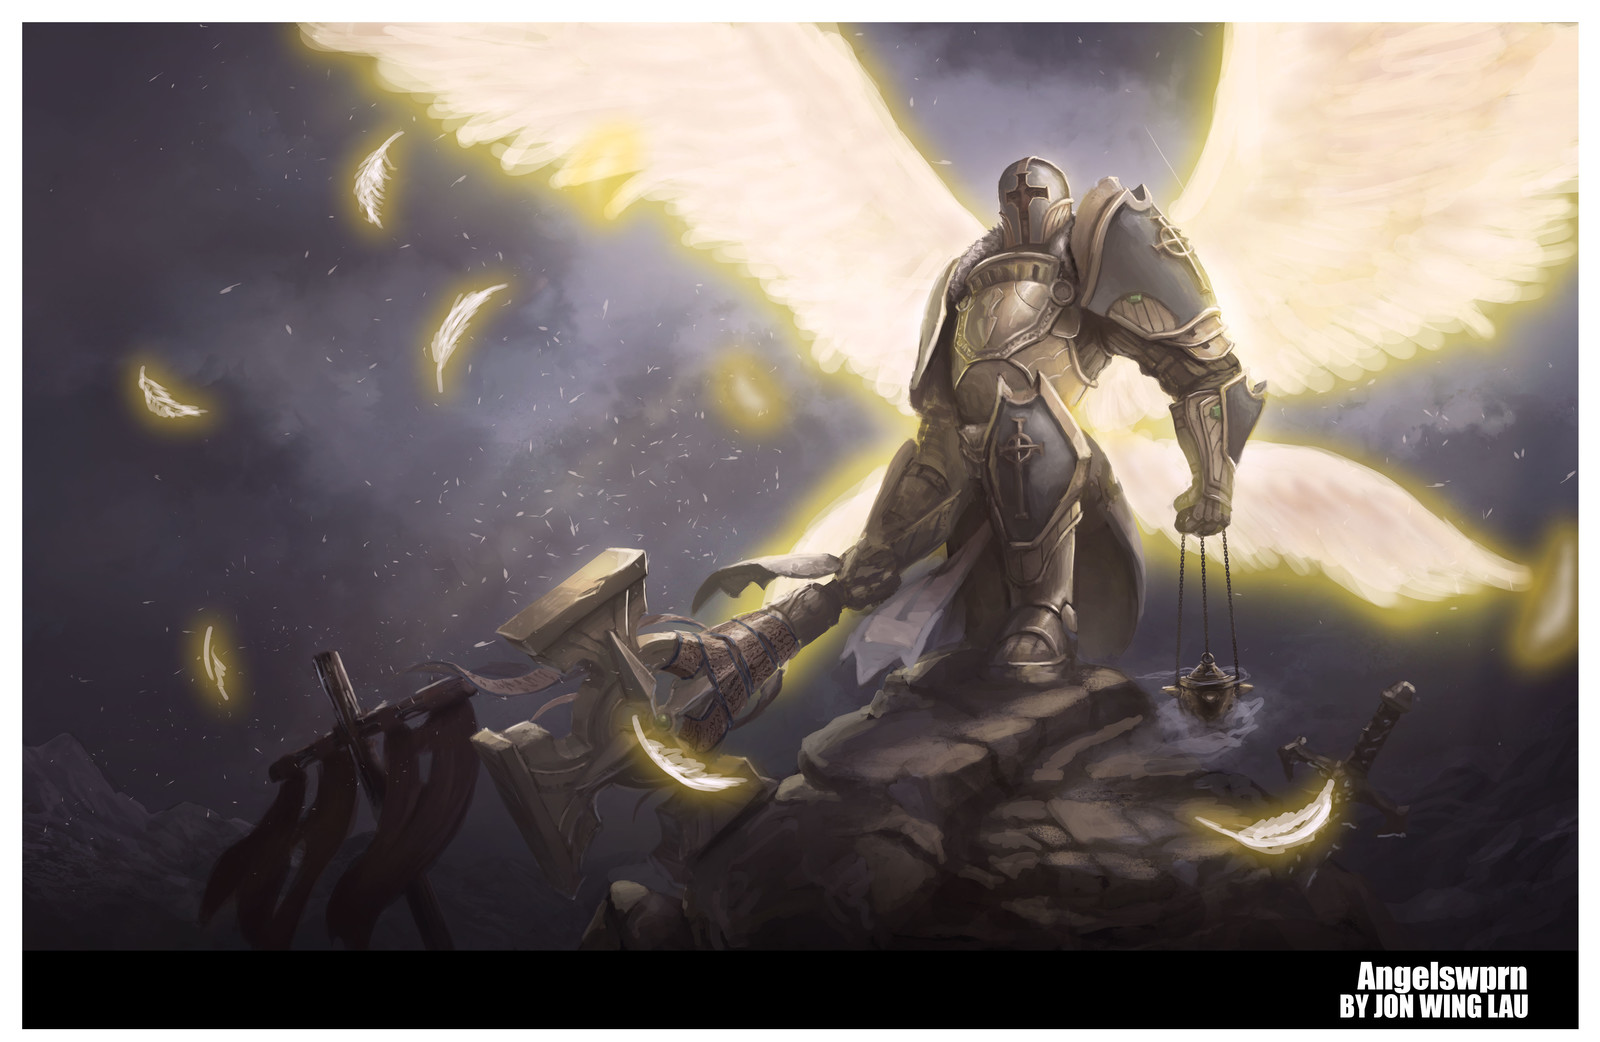 Angelsworn